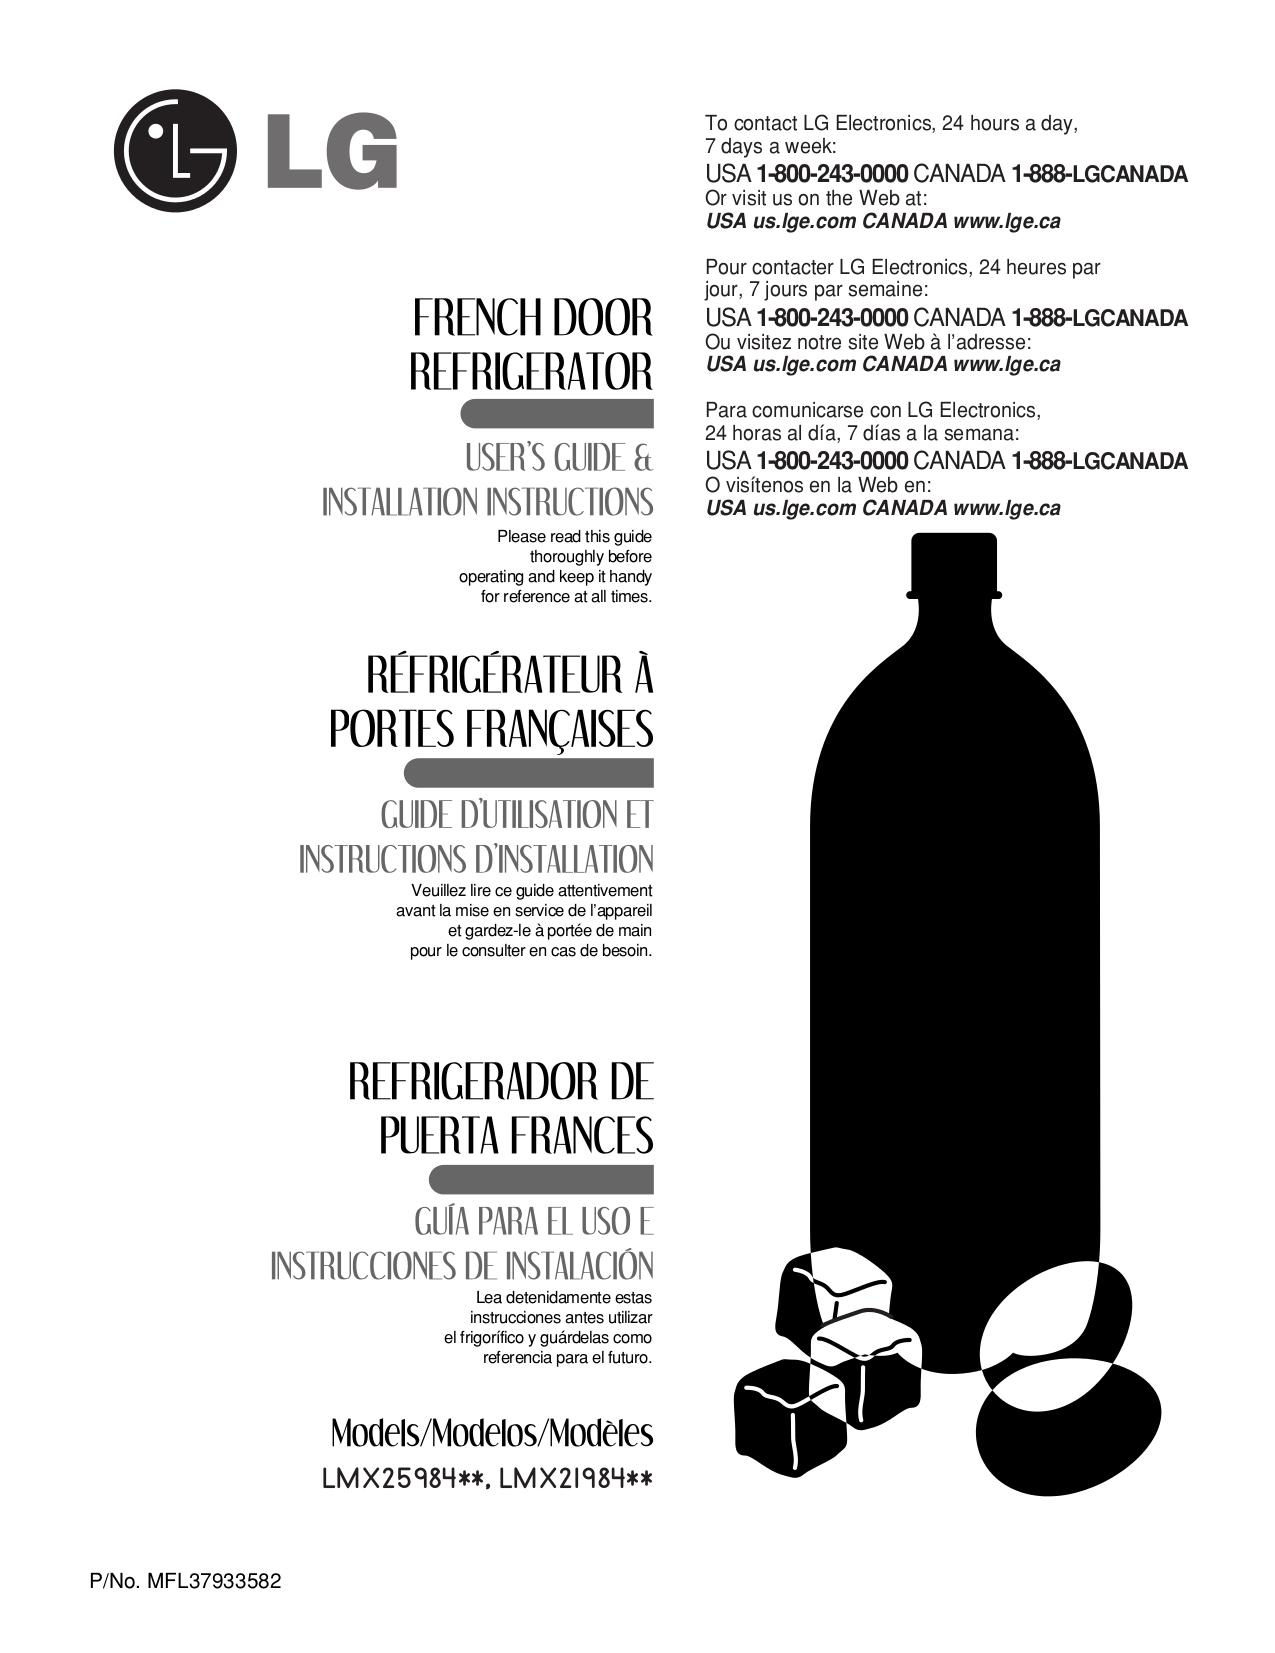 pdf for LG Refrigerator LMX25984 manual